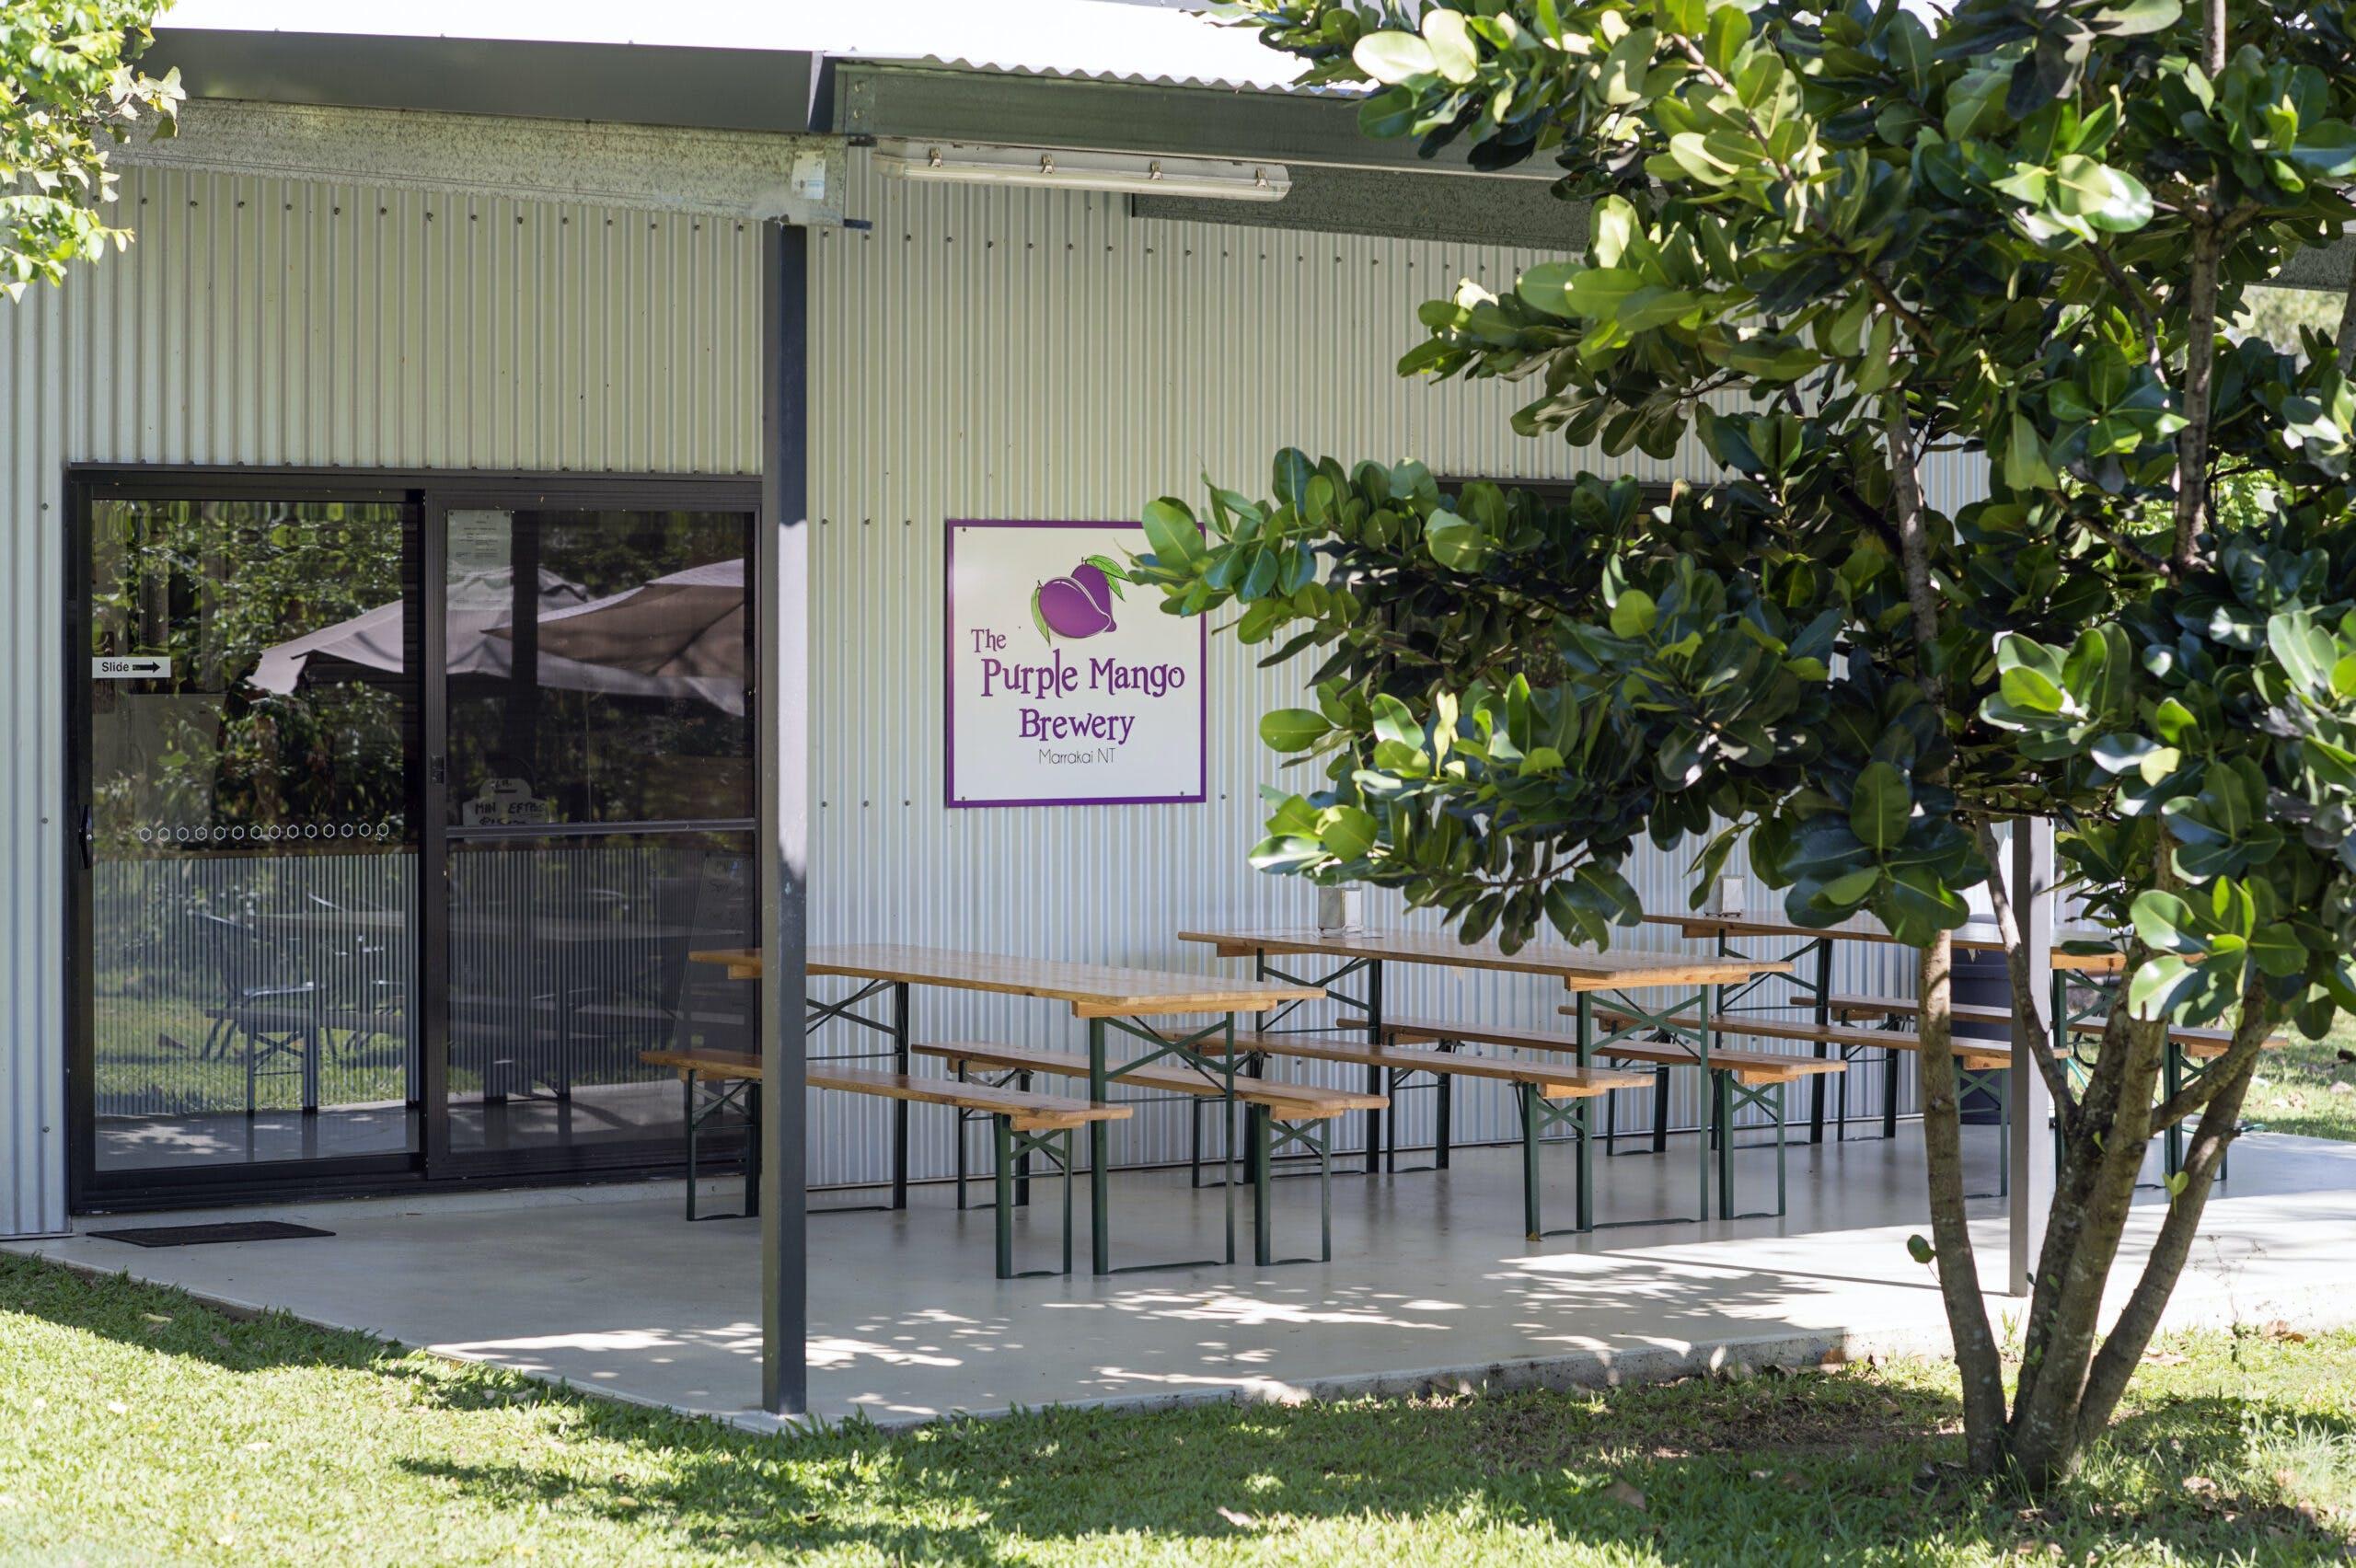 Purple Mango Camping and Brewery